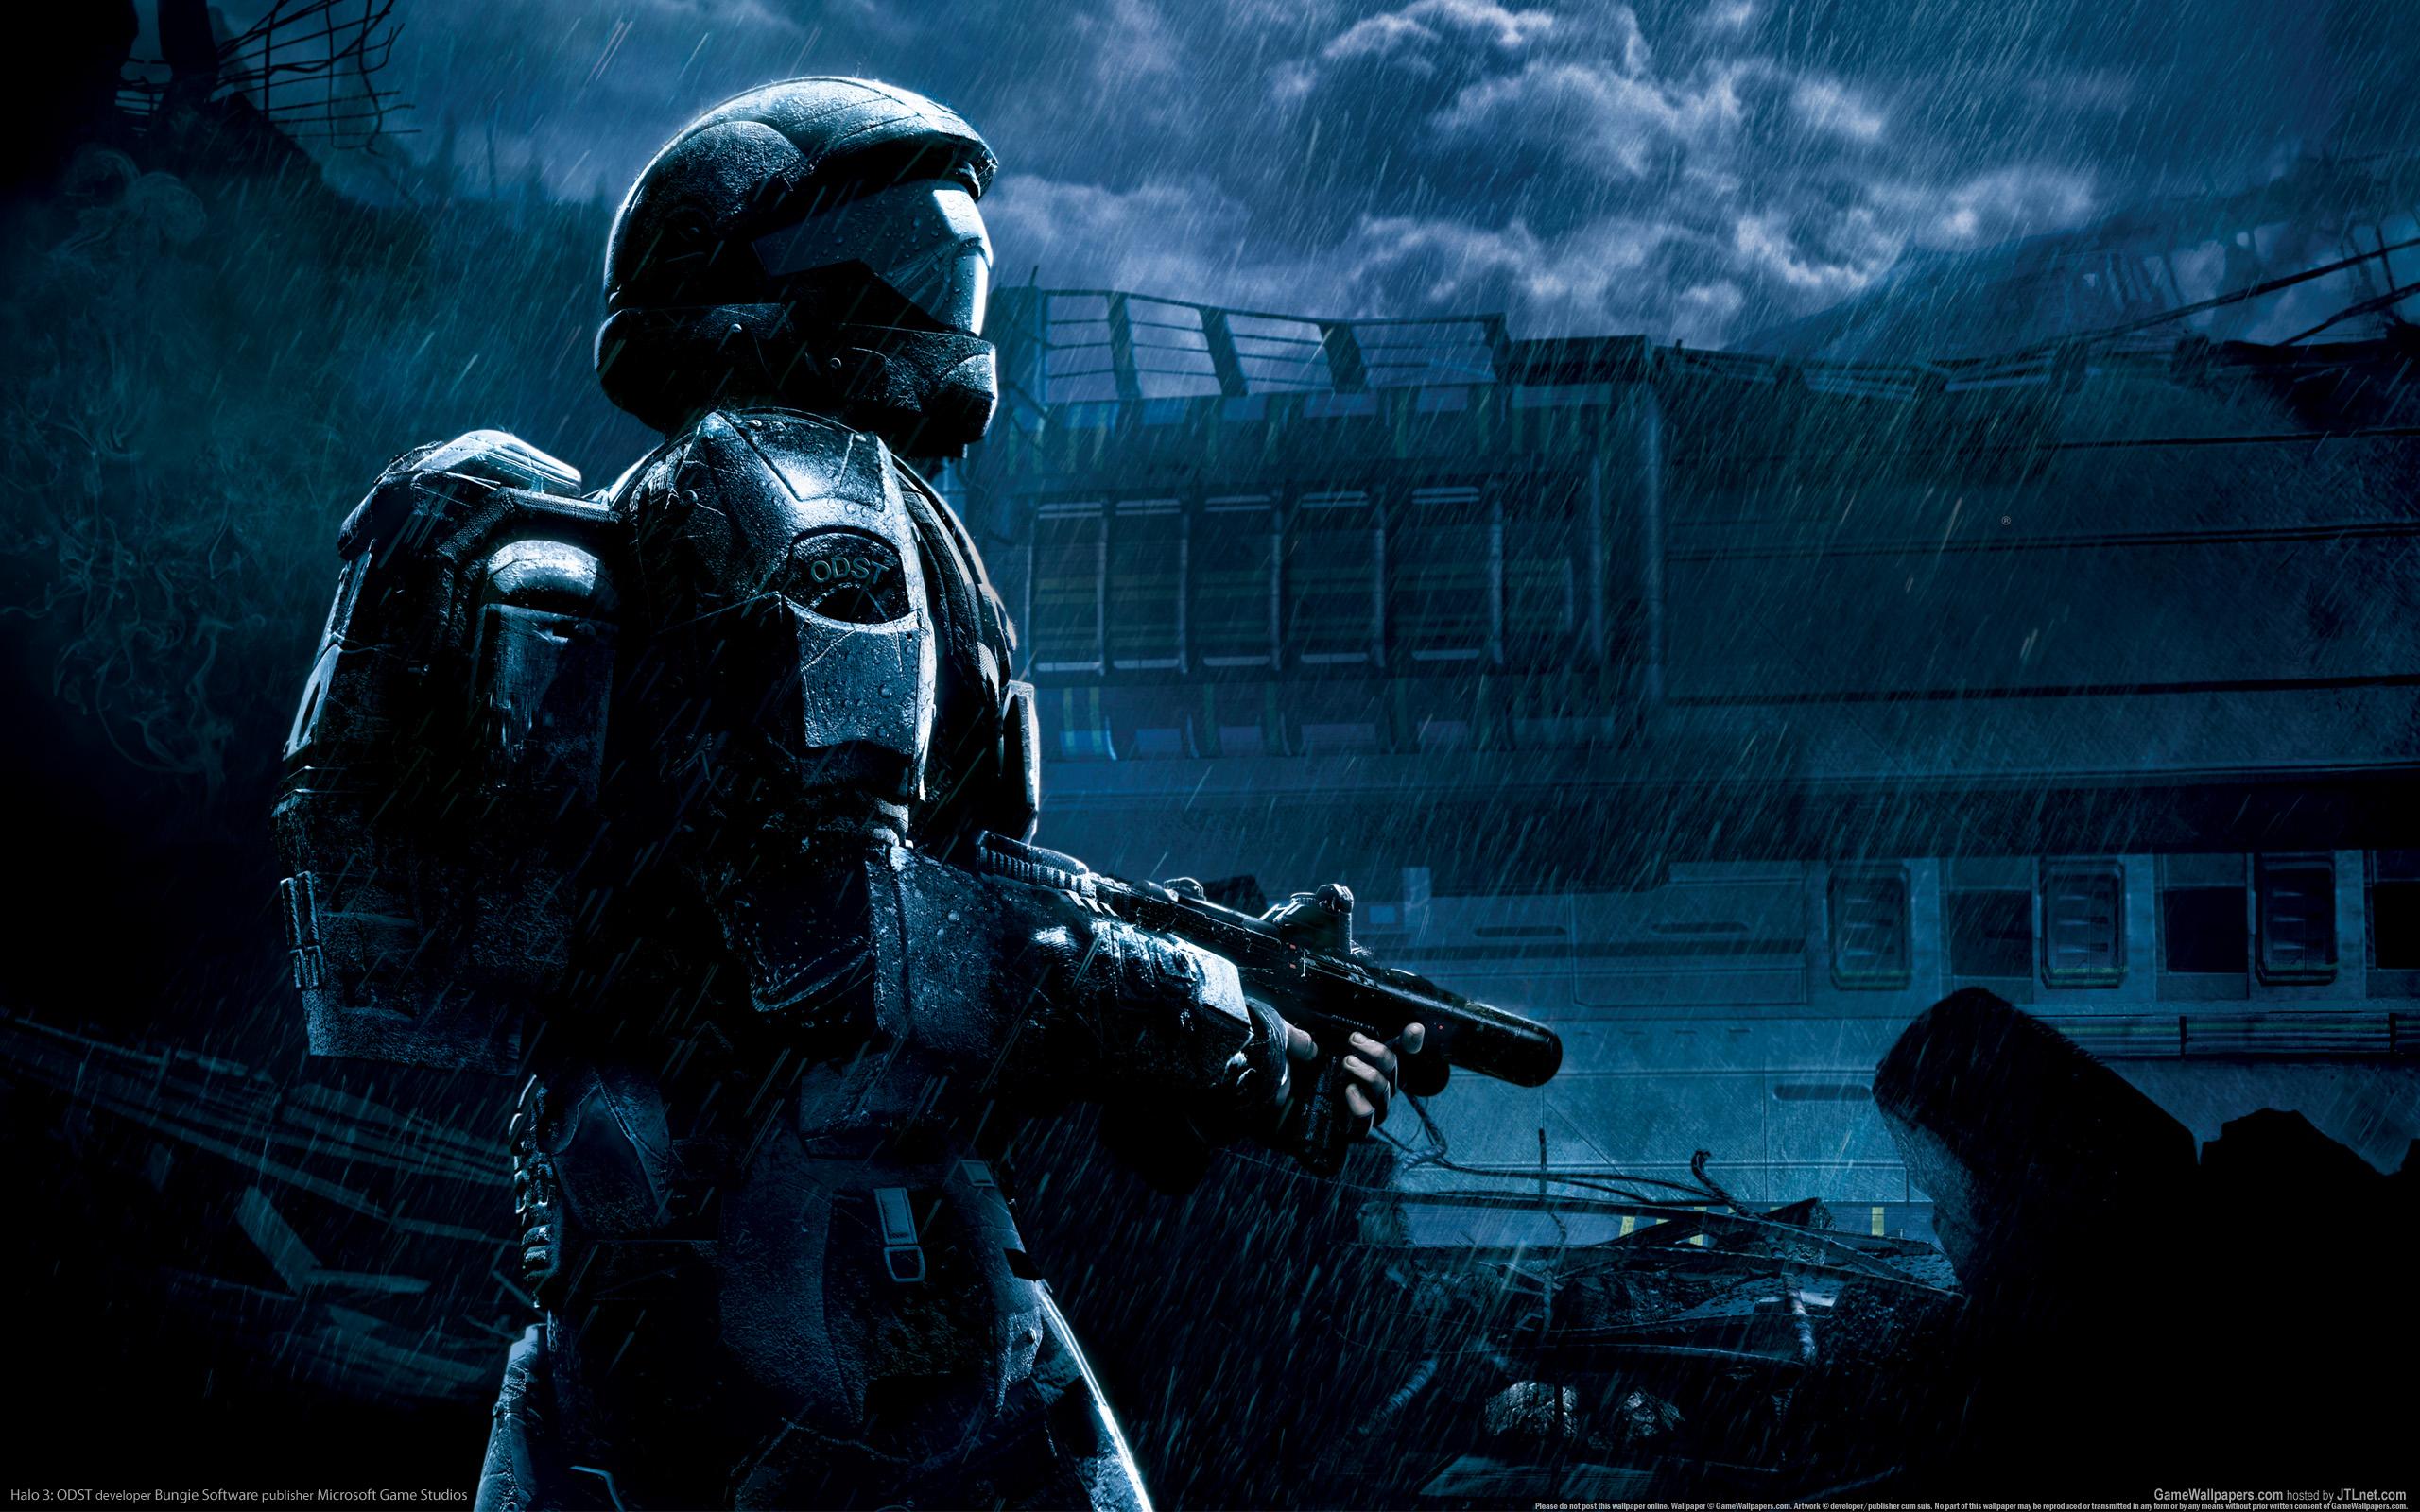 Halo 3 ODST Wallpaper - WallpaperSafari